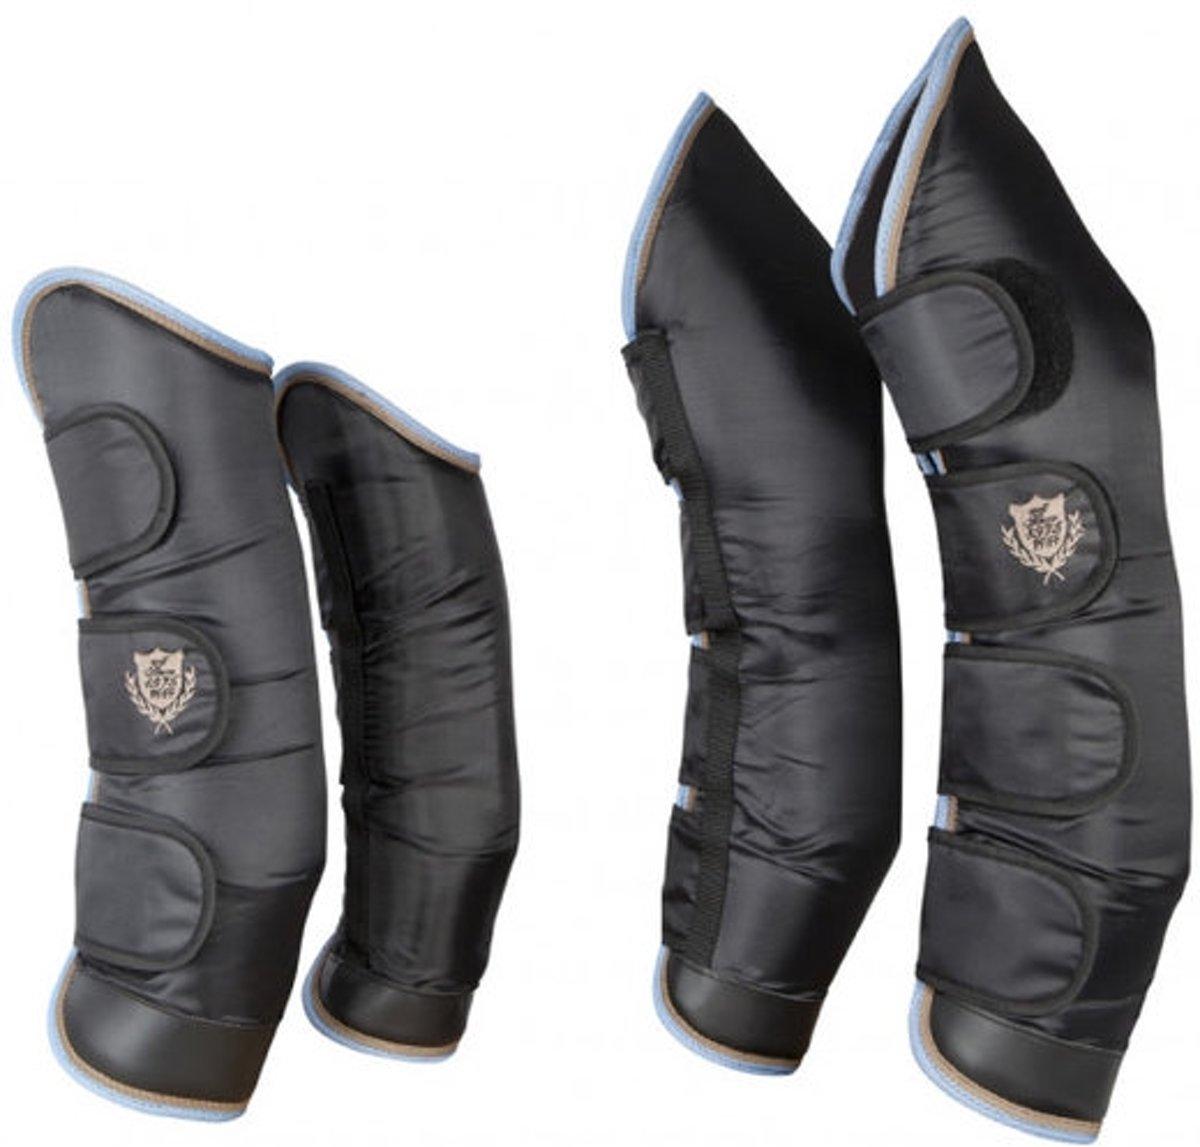 PFIFF Transportpeesbeschermers Barrow PONY Zwart kopen